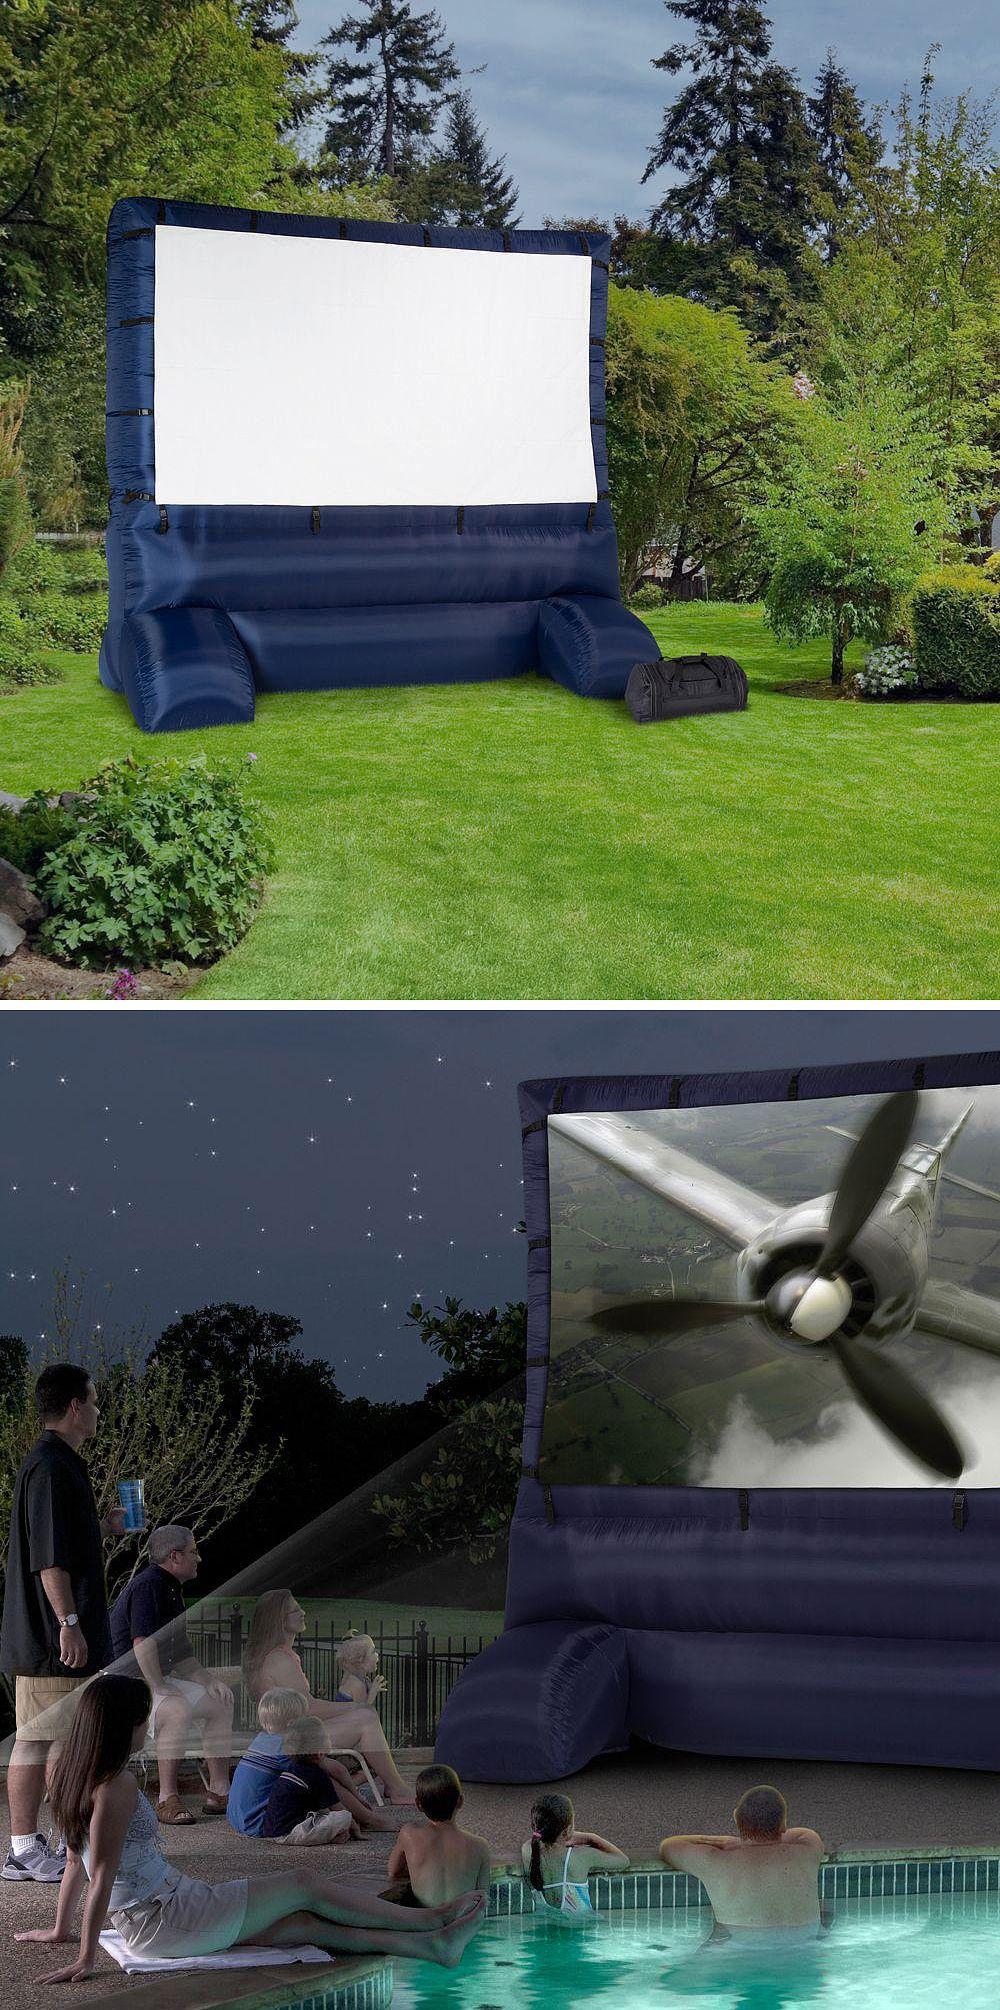 best idea ever for backyard fun outdoor movie night the screen